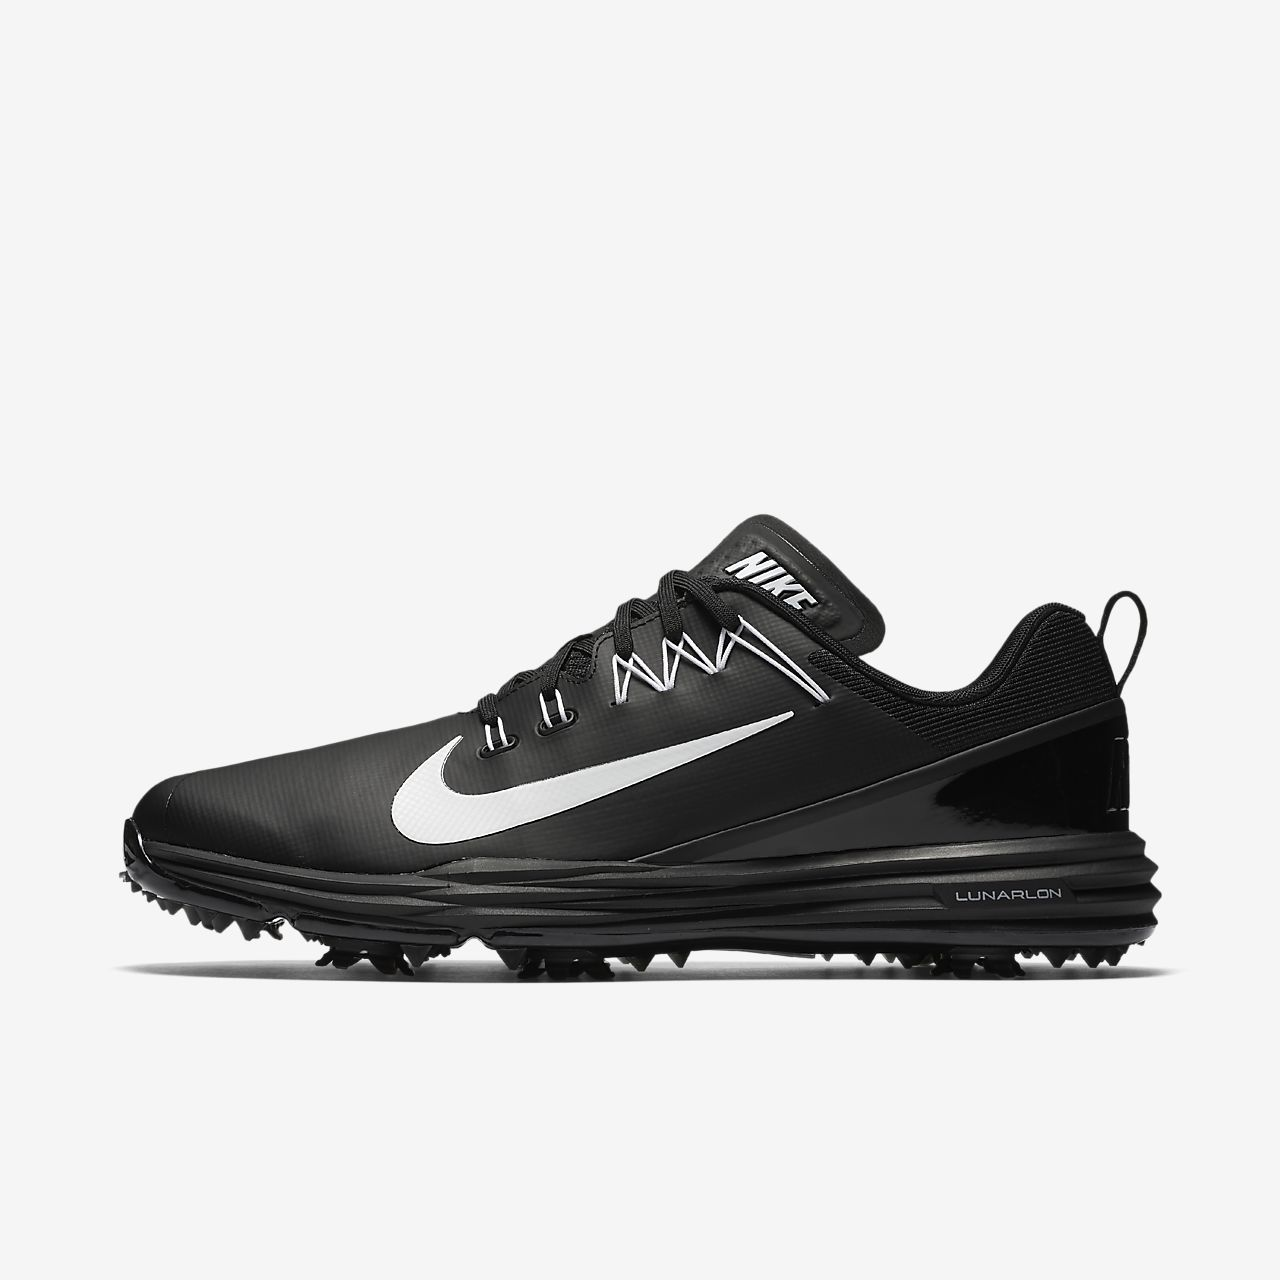 Nike Lunar Command 2 Sabatilles de golf - Home